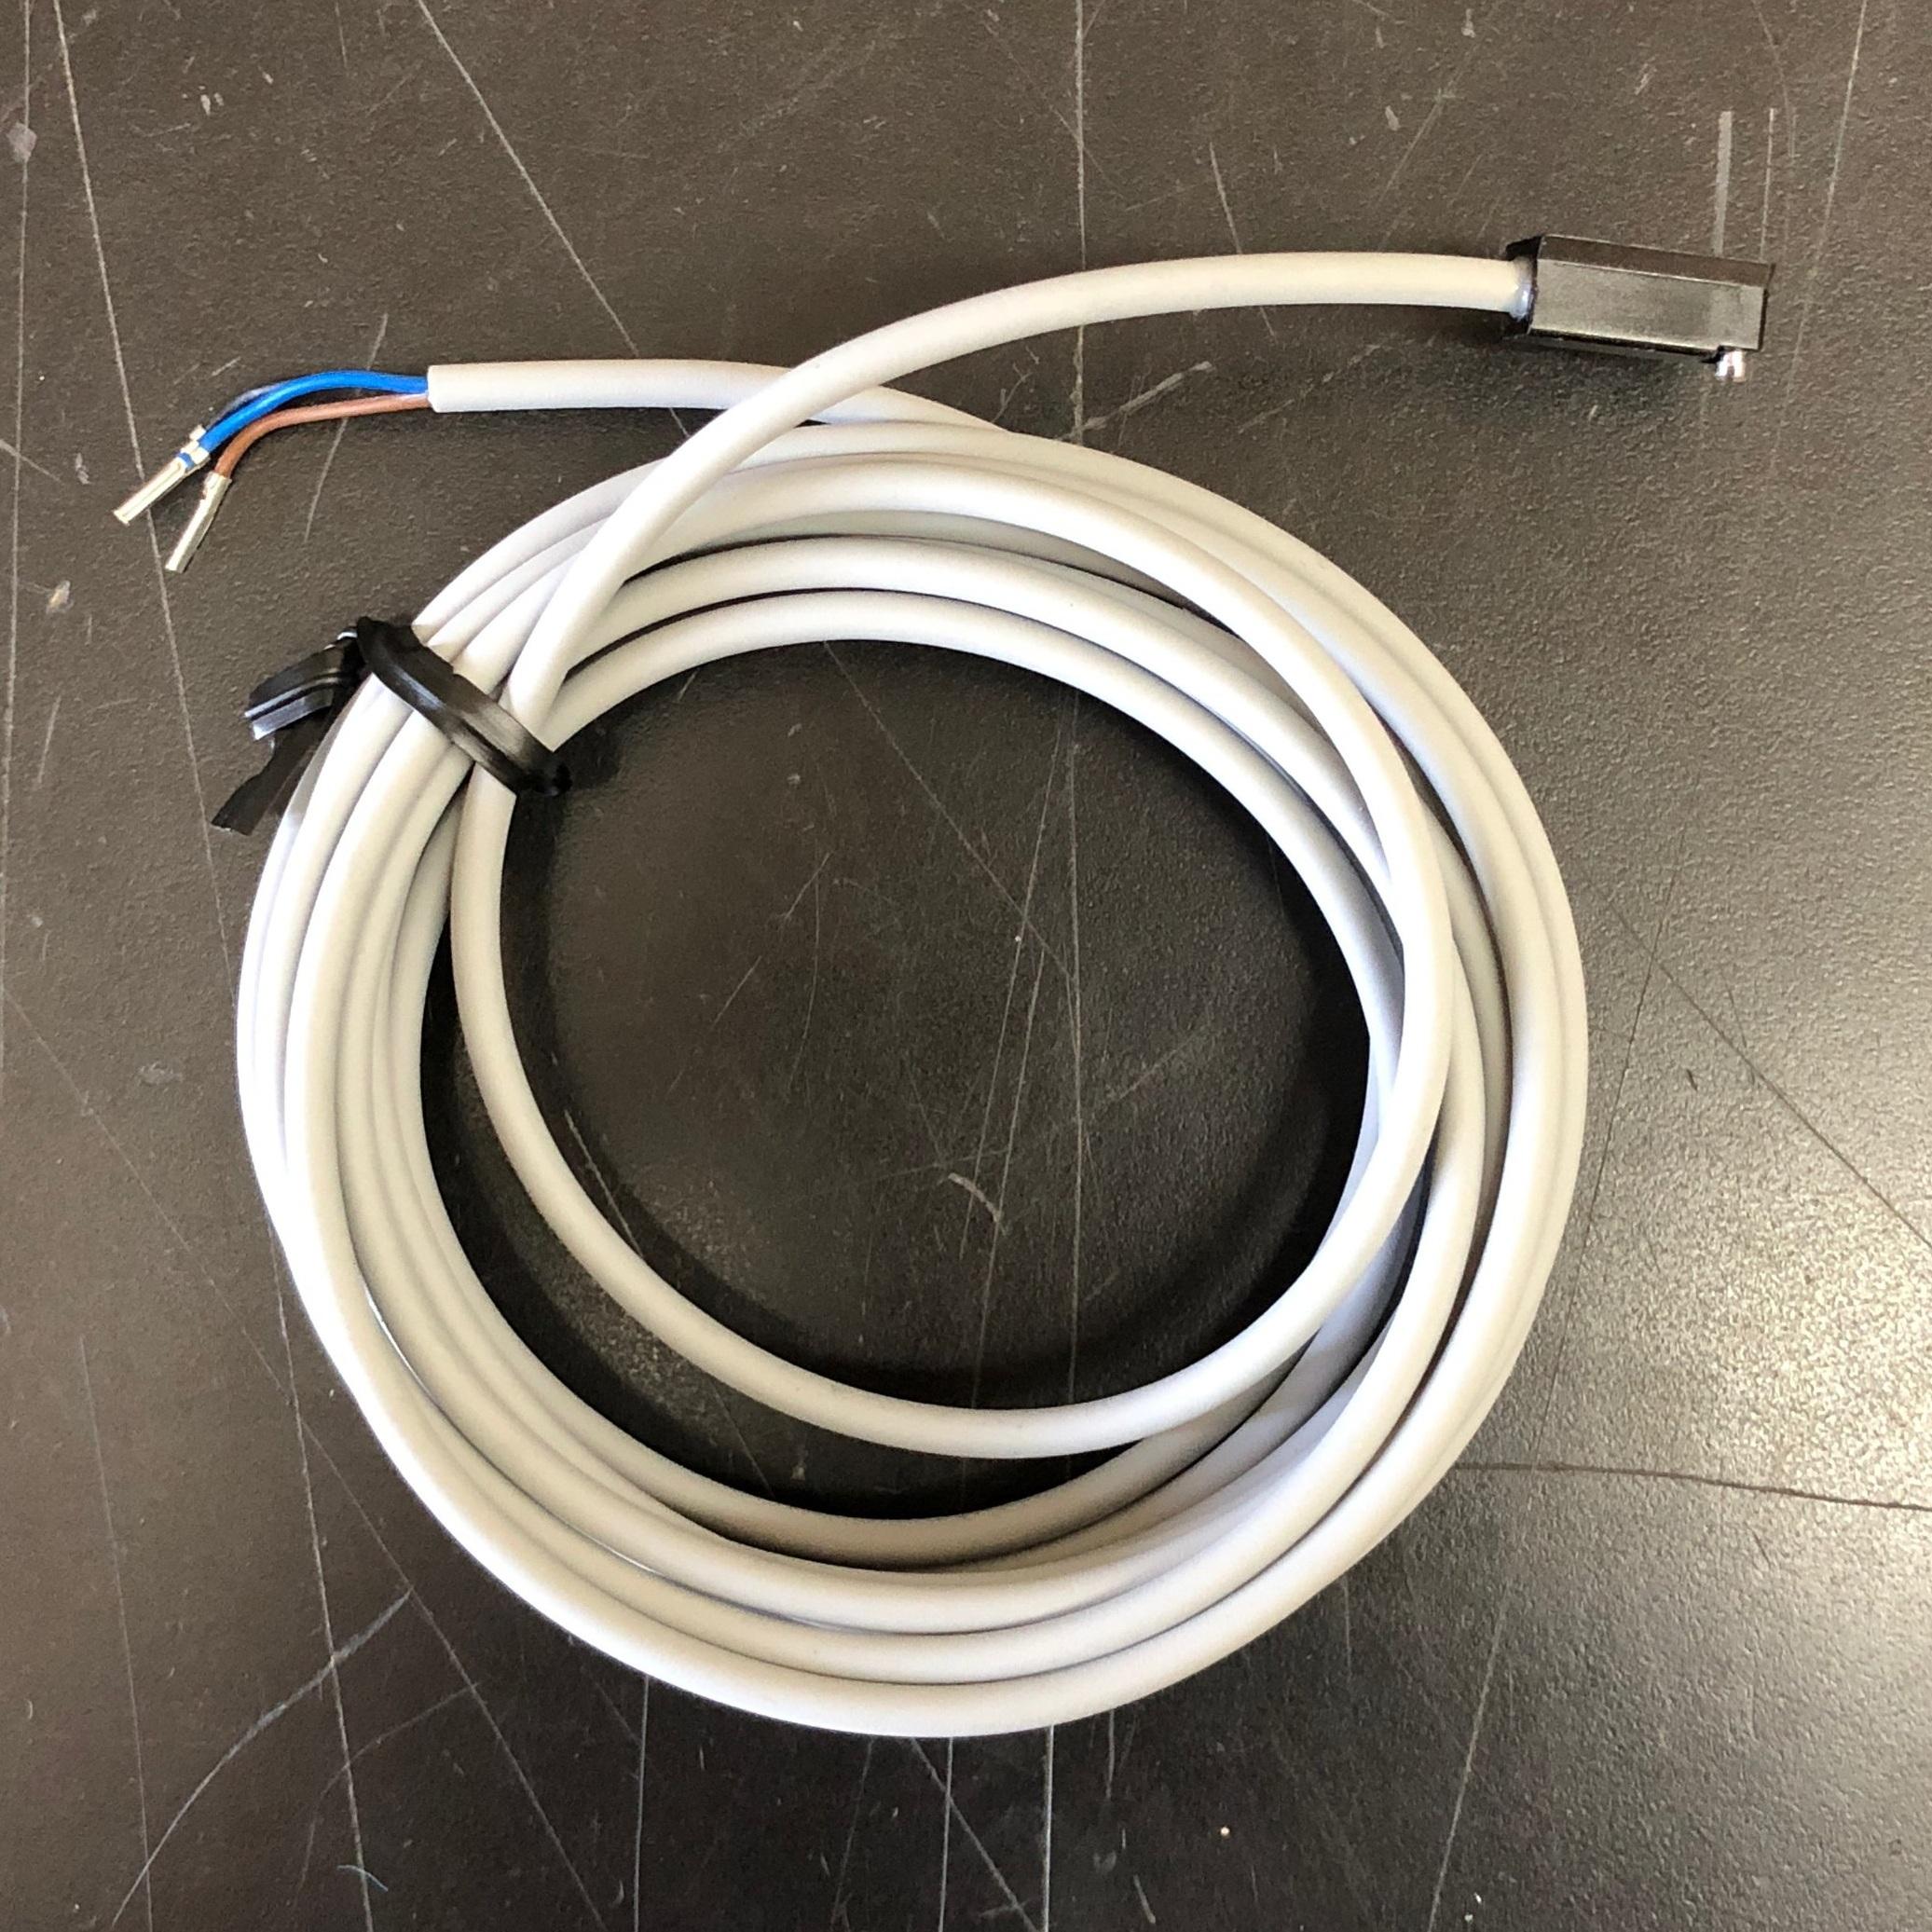 EL1275 - Spear Switch, MiniKing (Nason Cylinder Only)